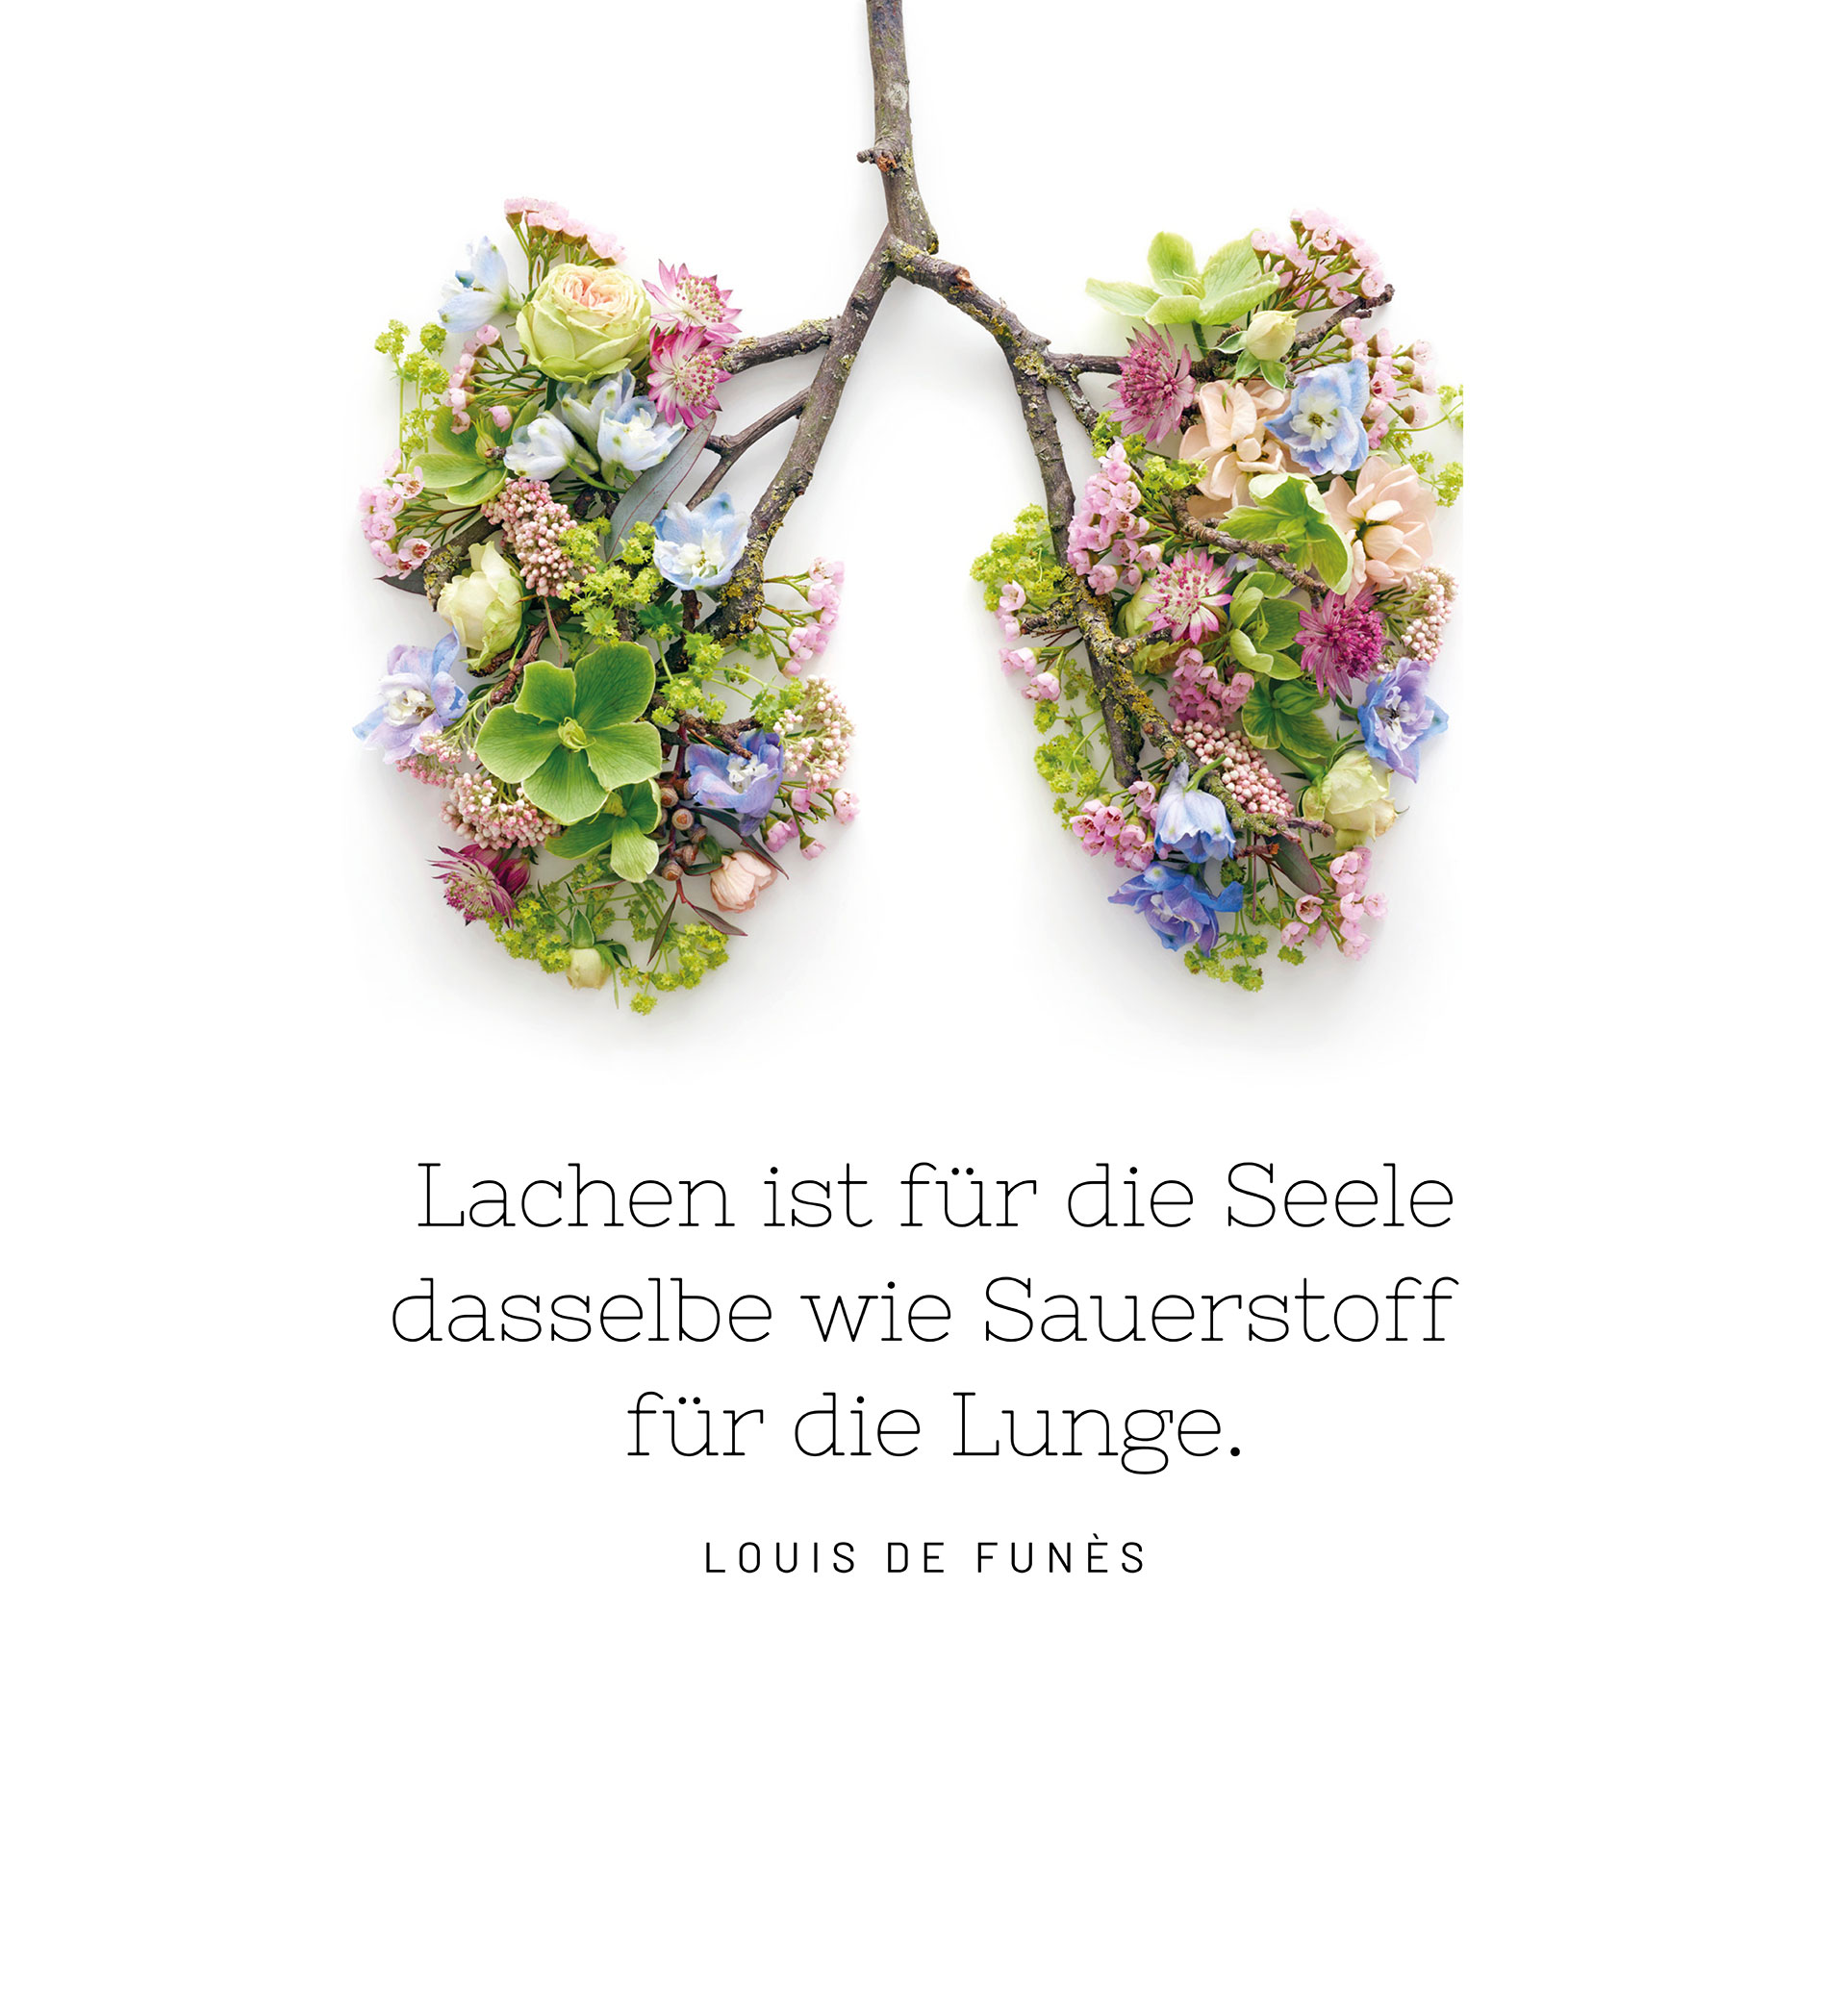 Fritz-Idiag_Atemlounge1.jpg